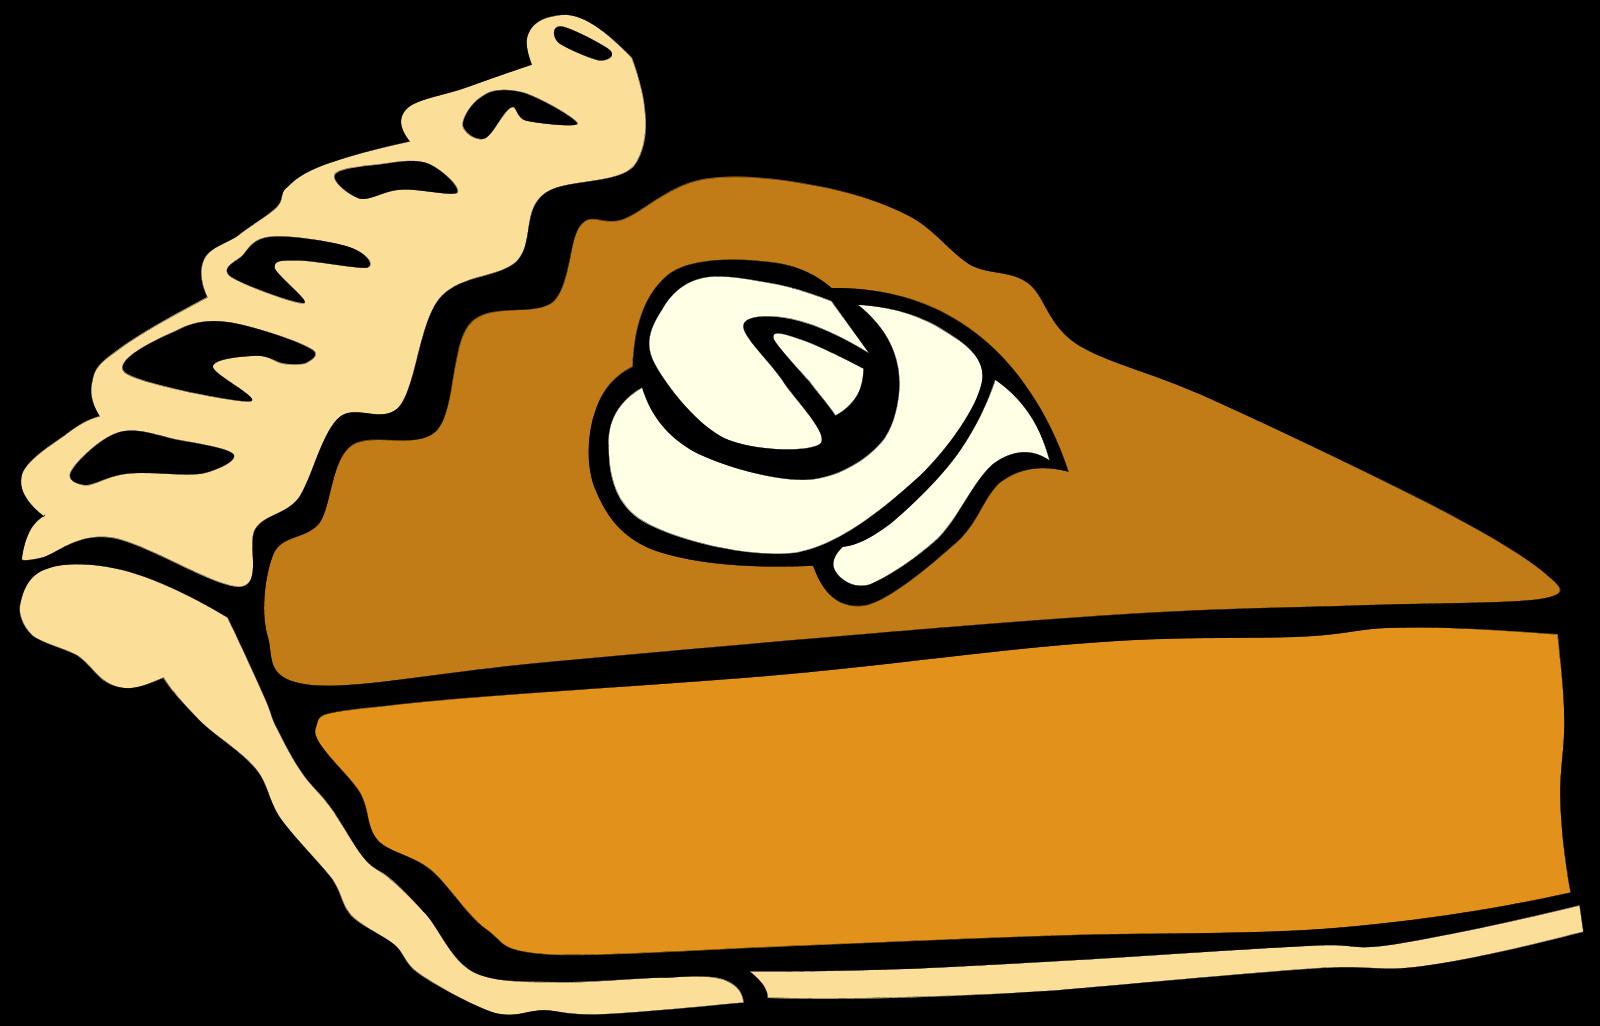 Pie clipart comfort food. Thanksgiving